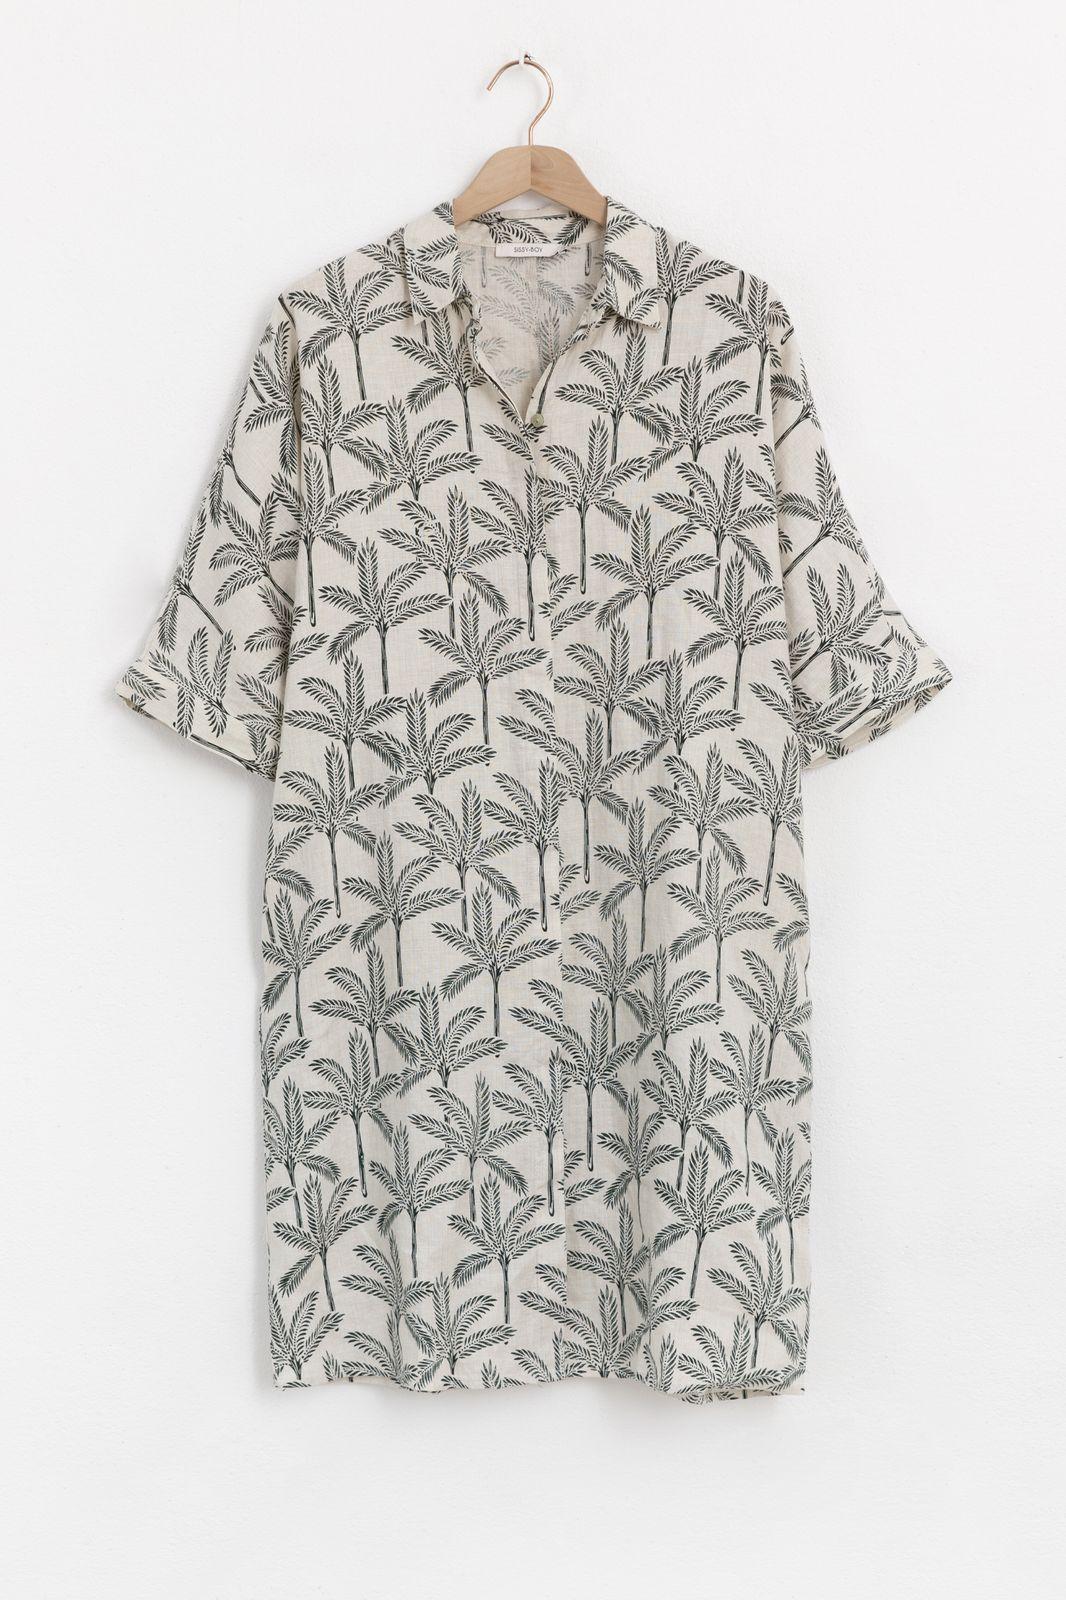 Linnen overhemd jurk met all over palmboom print